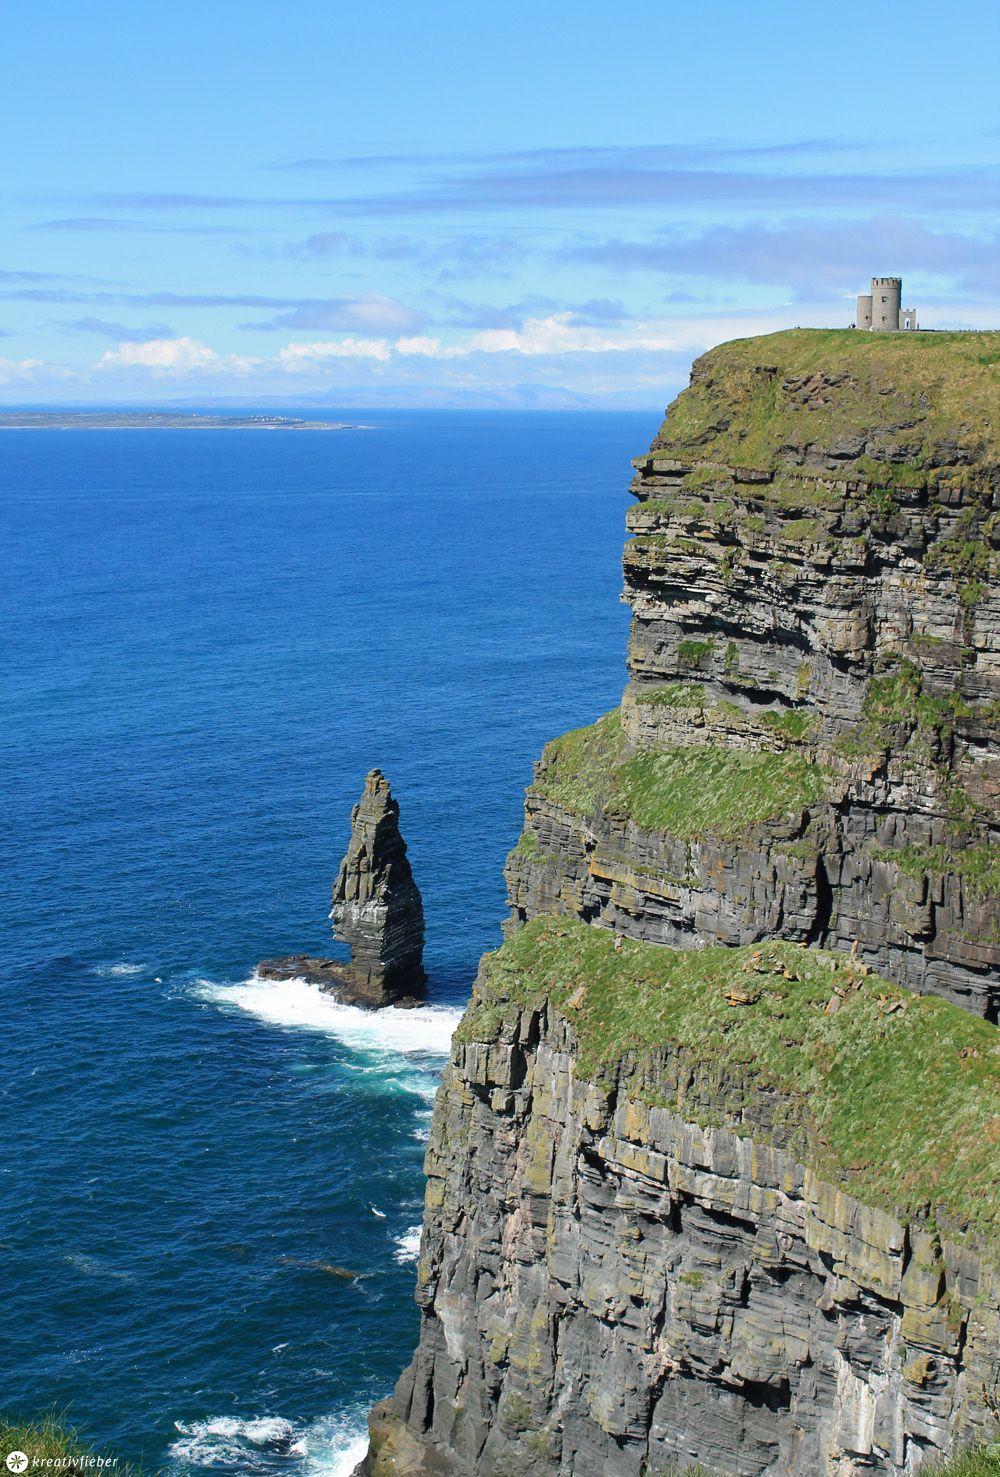 Irland Cliffs Of Moher Karte.Irland Roadtrip Burren Und Cliffs Of Moher Urlaub Karten